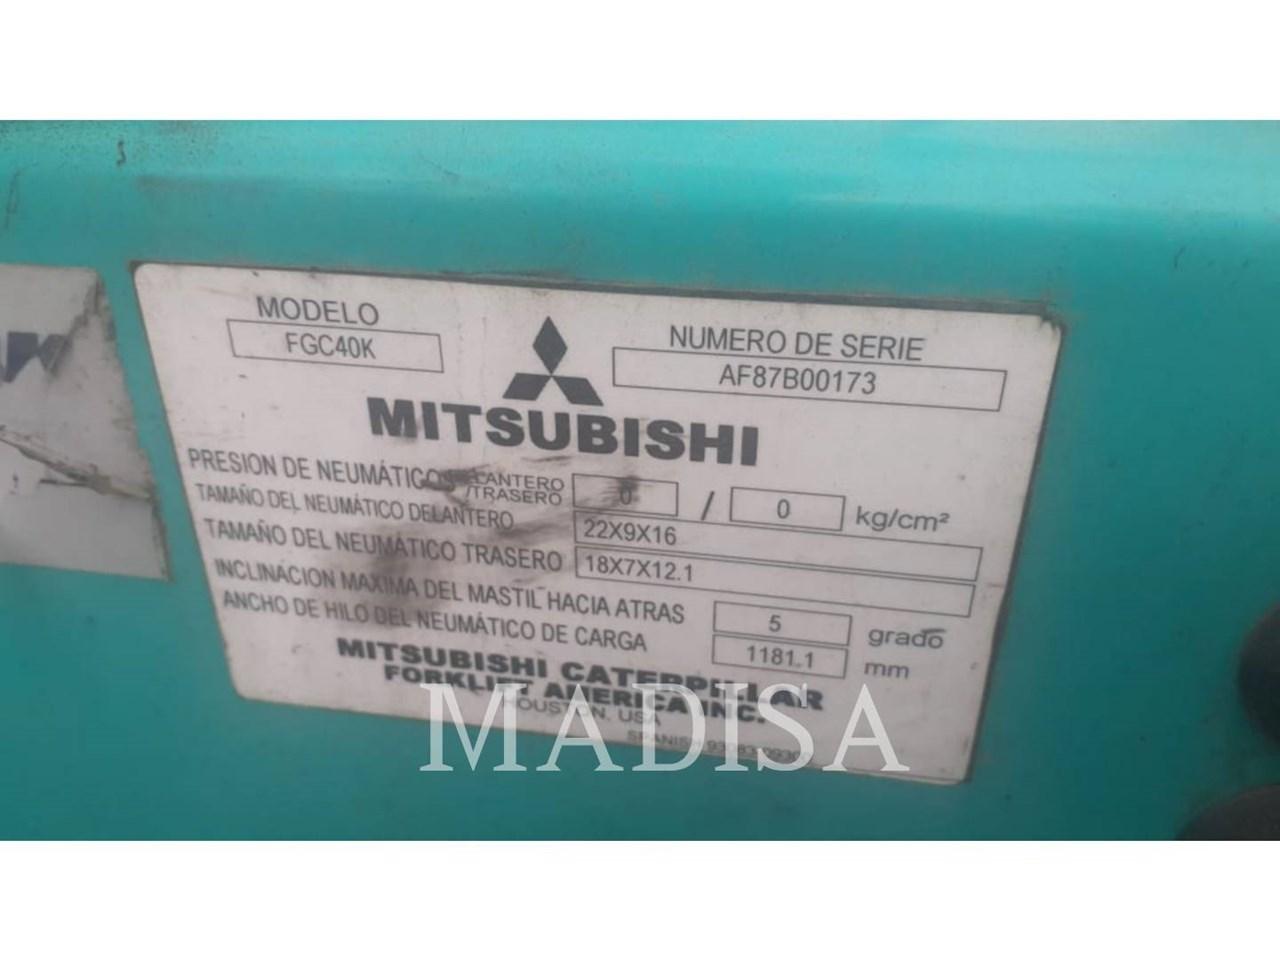 2016 Mitsubishi FGC40K Image 5